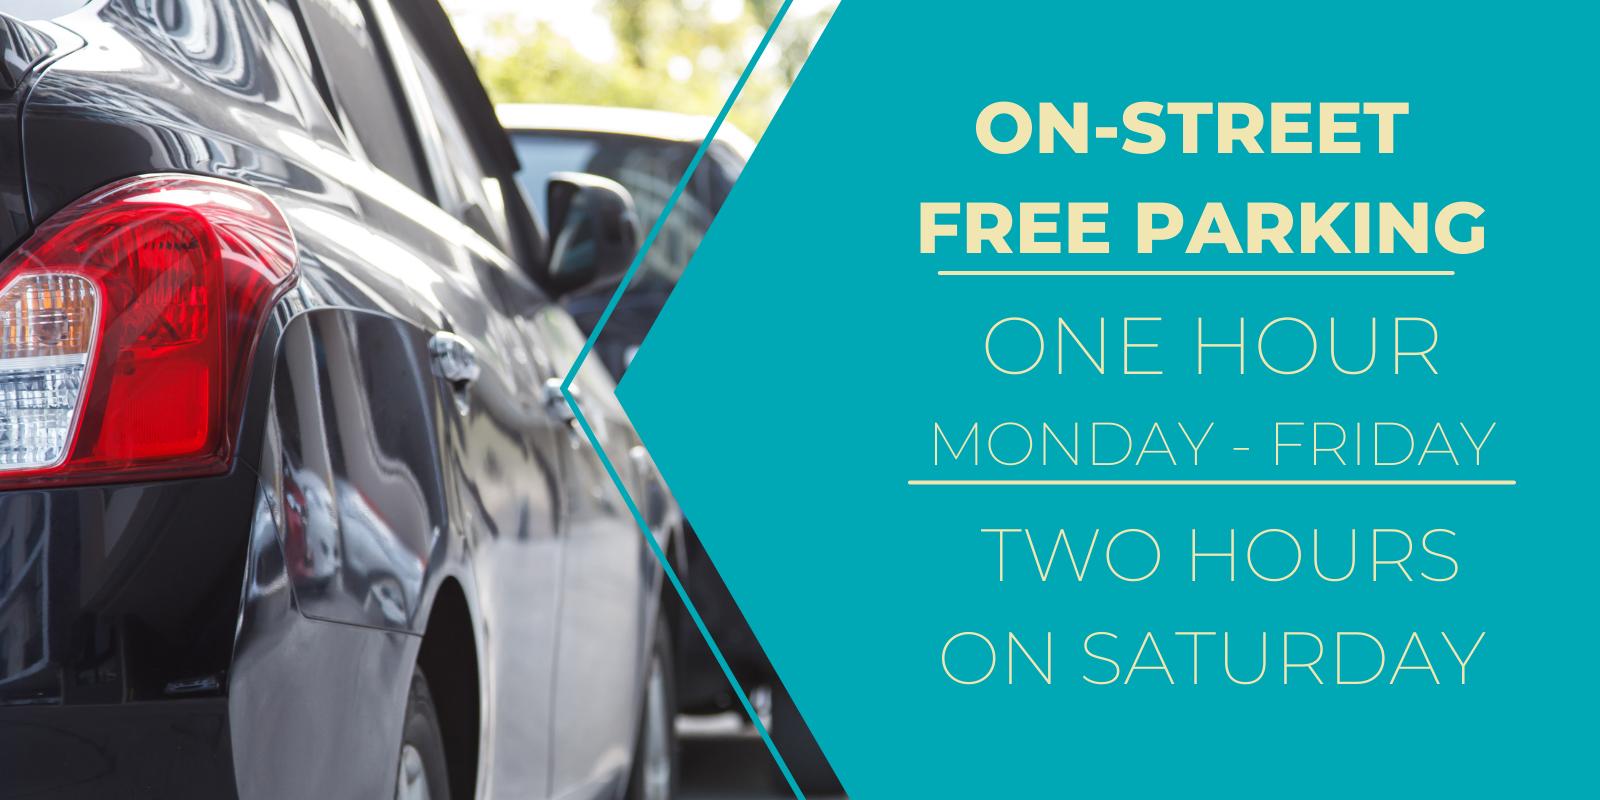 on-street free parking